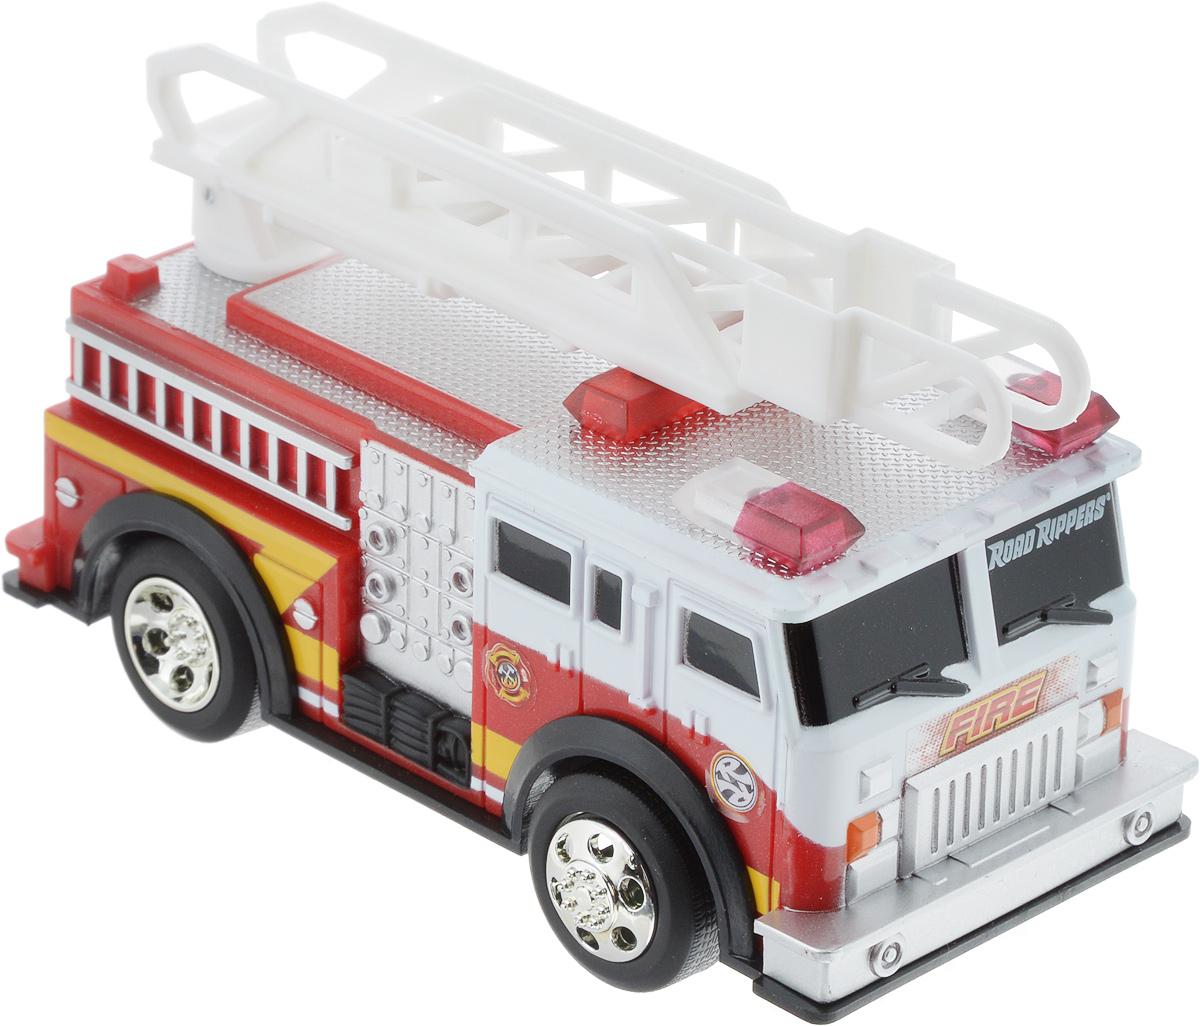 Toystate Машина Спецслужба Пожарная toystate машина спецслужба police